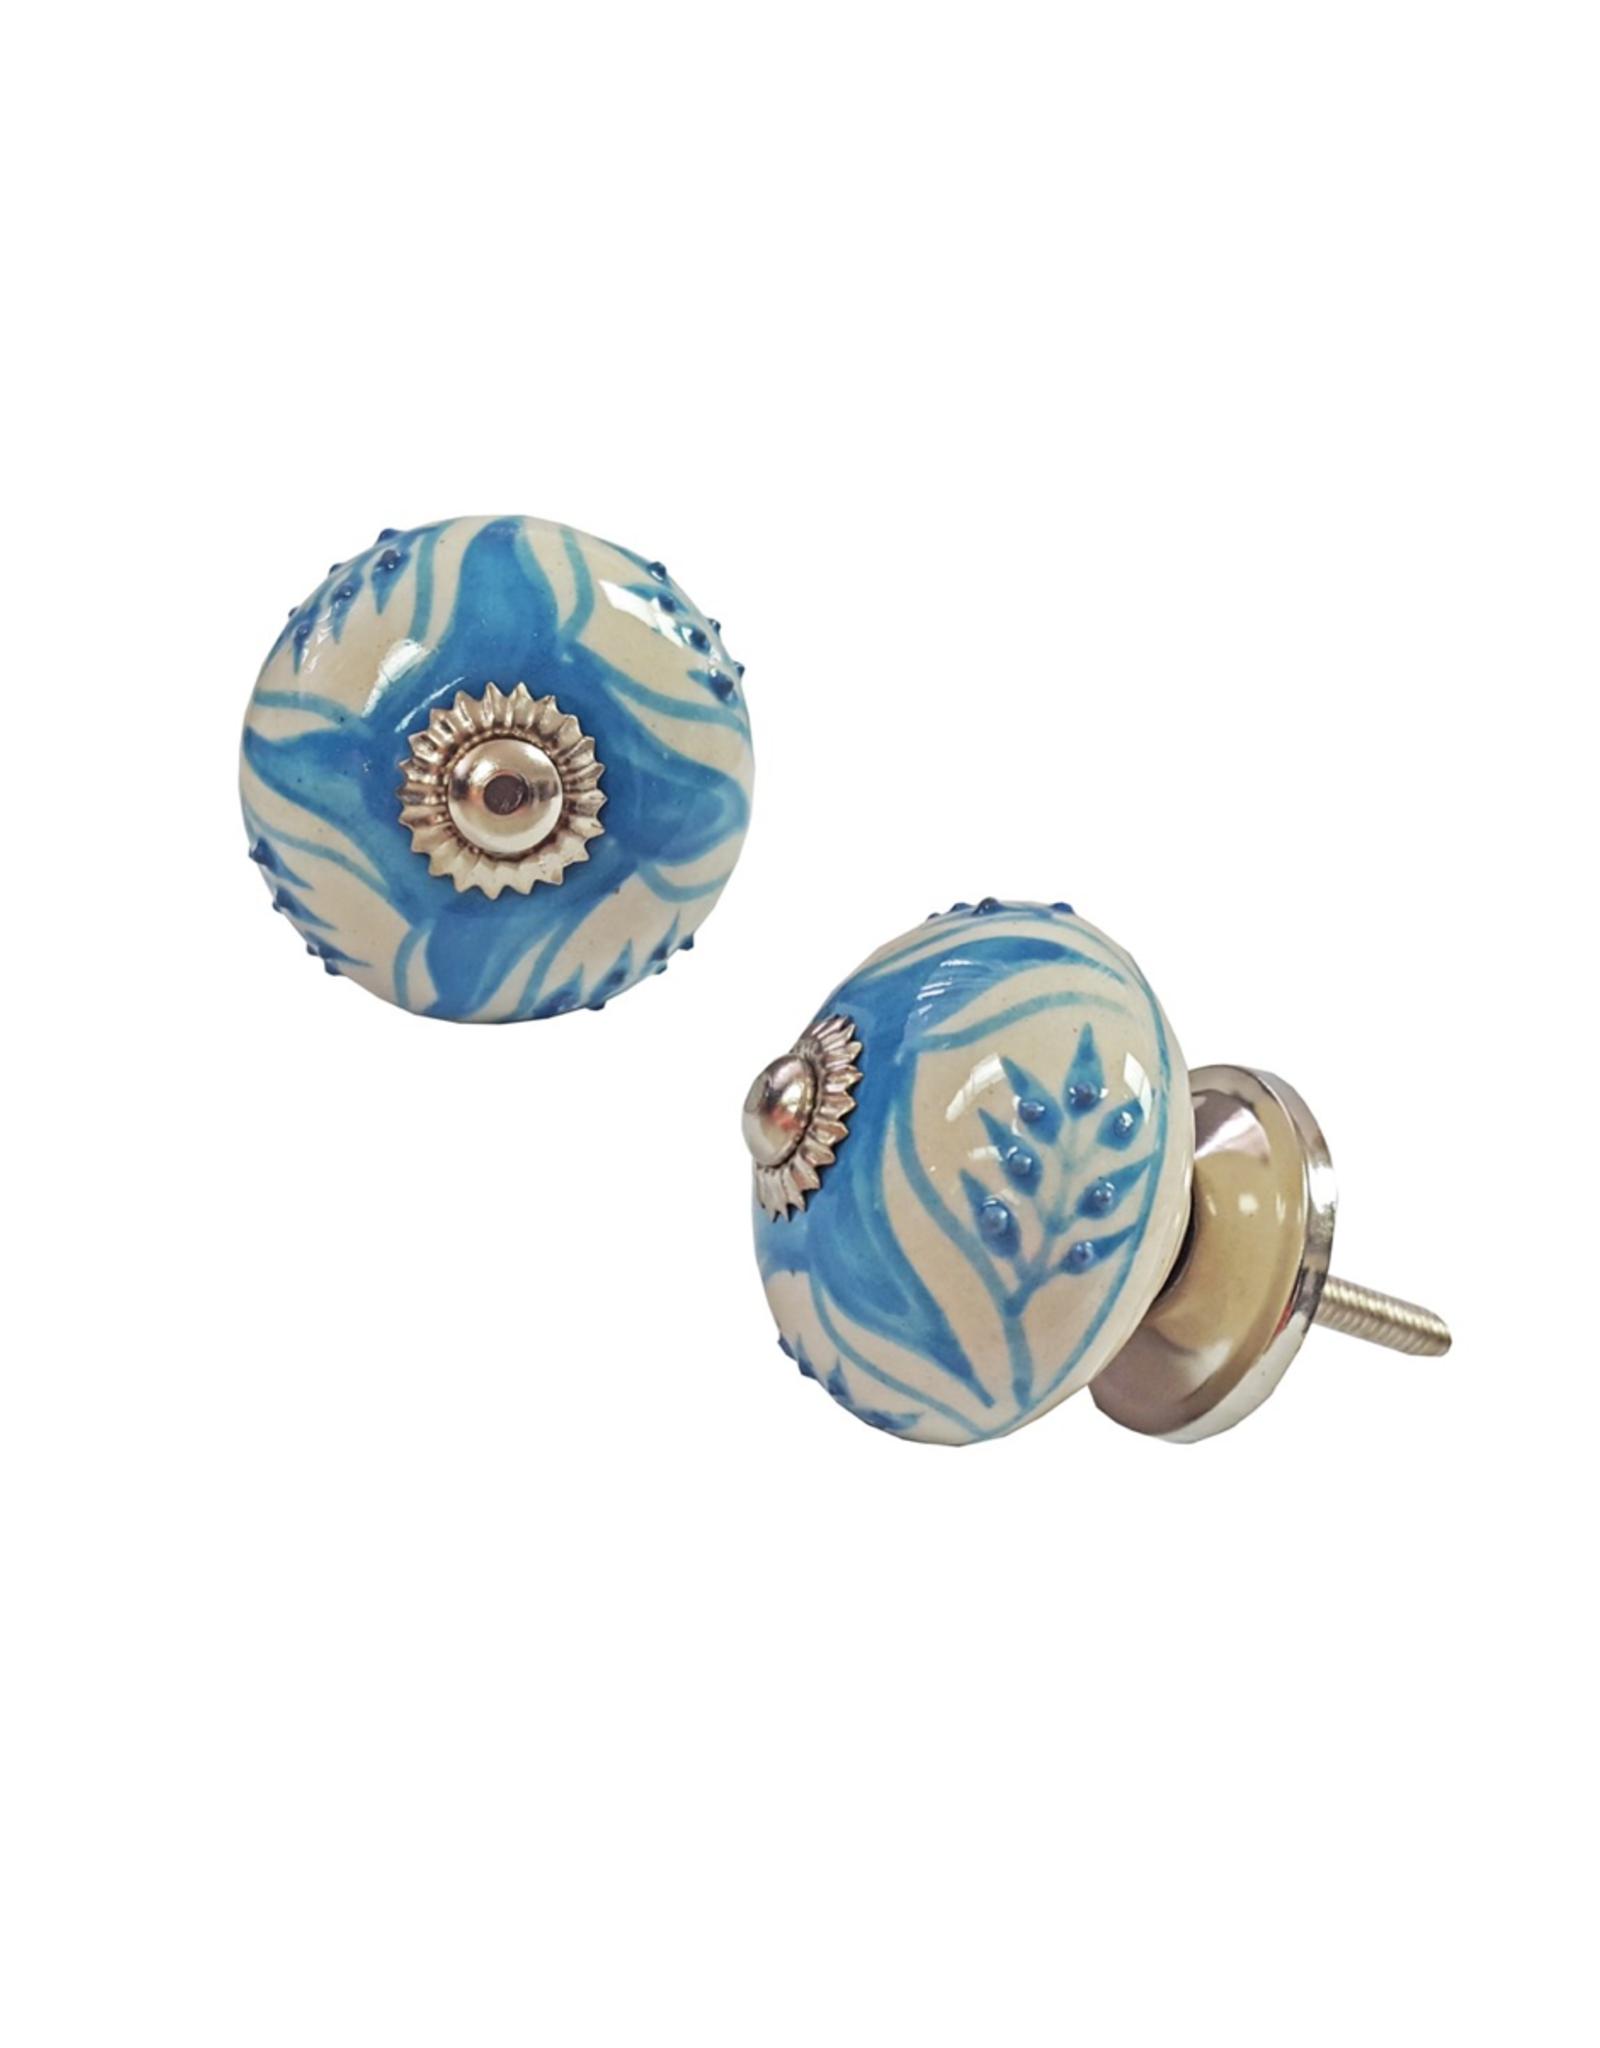 NTH - Knob / Blue Leaves, Ceramic